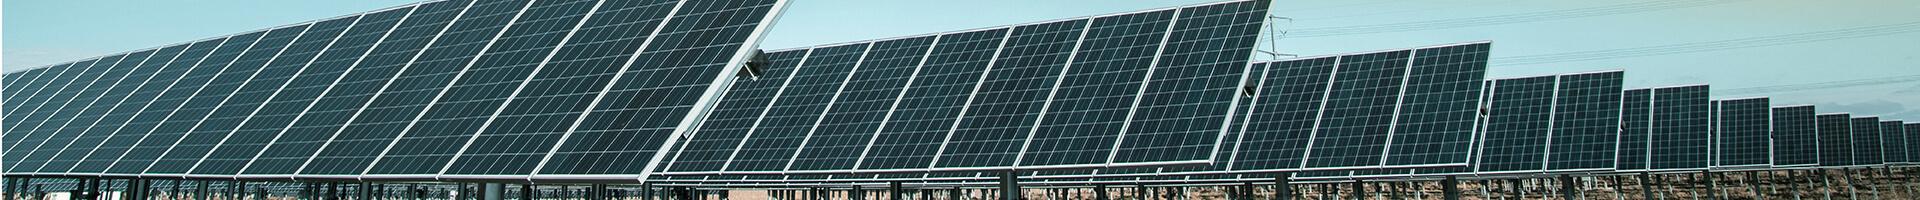 Header image - solar panels